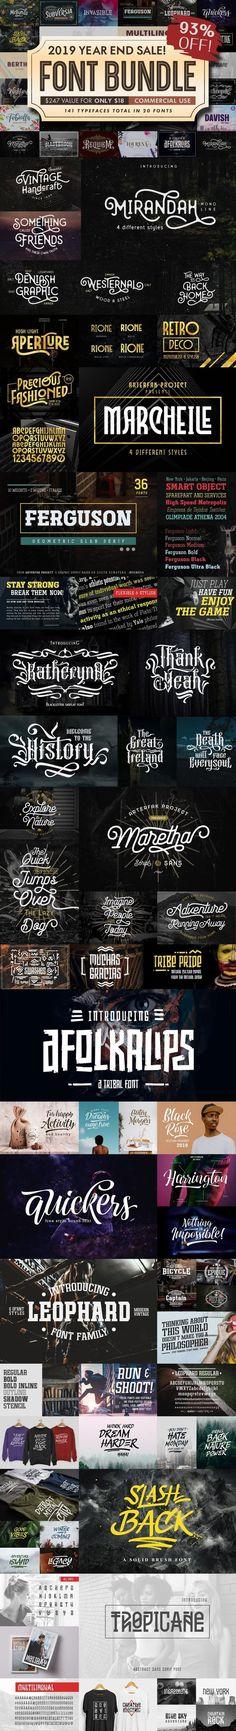 Font Bundle 2019 | 93%OFF #truetype #monolinefont #artnouveau #photography #opentypefont #BestScriptFonts #ScriptFonts #bundle #swash #font #brush #typeface #retro #handmadefont #header #strong #flowyfont #truetype #cursivefont Cursive Fonts, Typography Fonts, Typography Design, Lettering, Wedding Fonts, Wedding Invitations, Victorian Fonts, Farmhouse Font, Open Type